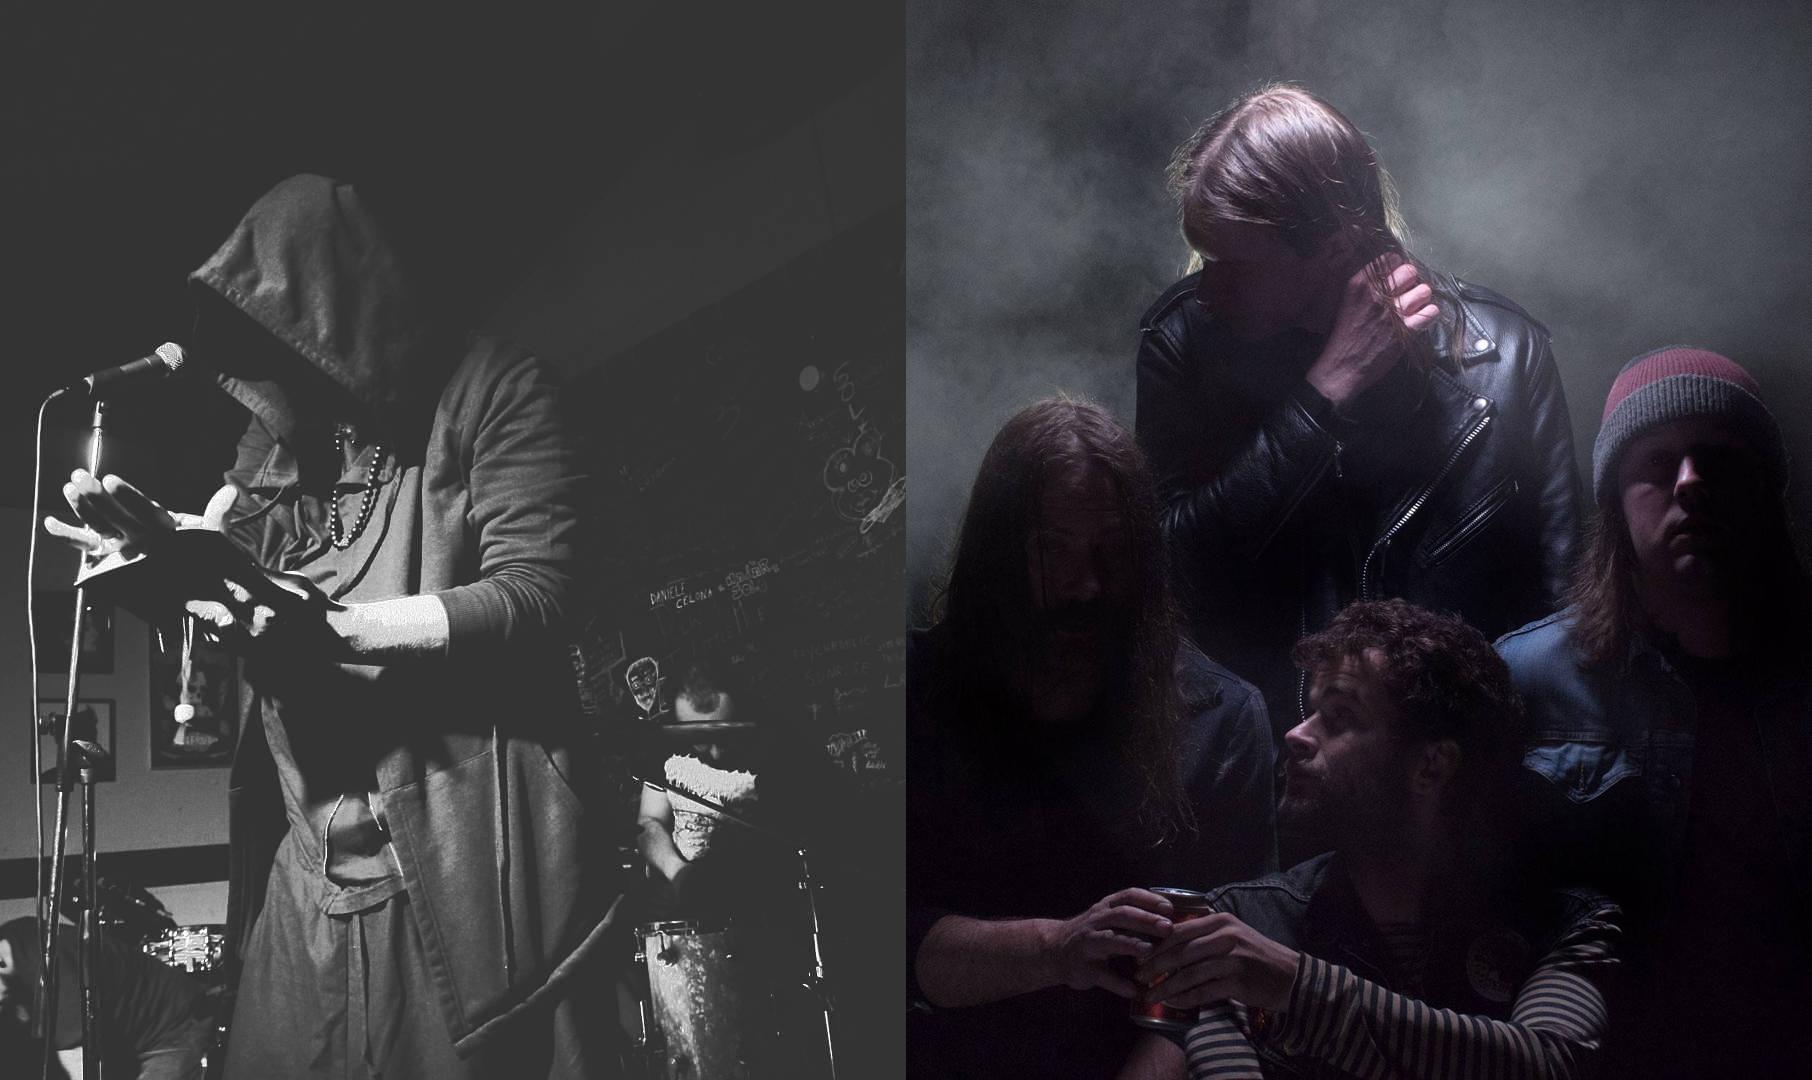 LaColpa + Holy Serpent - ITA // Sludge - Black Metal - NoiseAUS // Heavy Psych Rock7 settembre 2019 - h 22.00